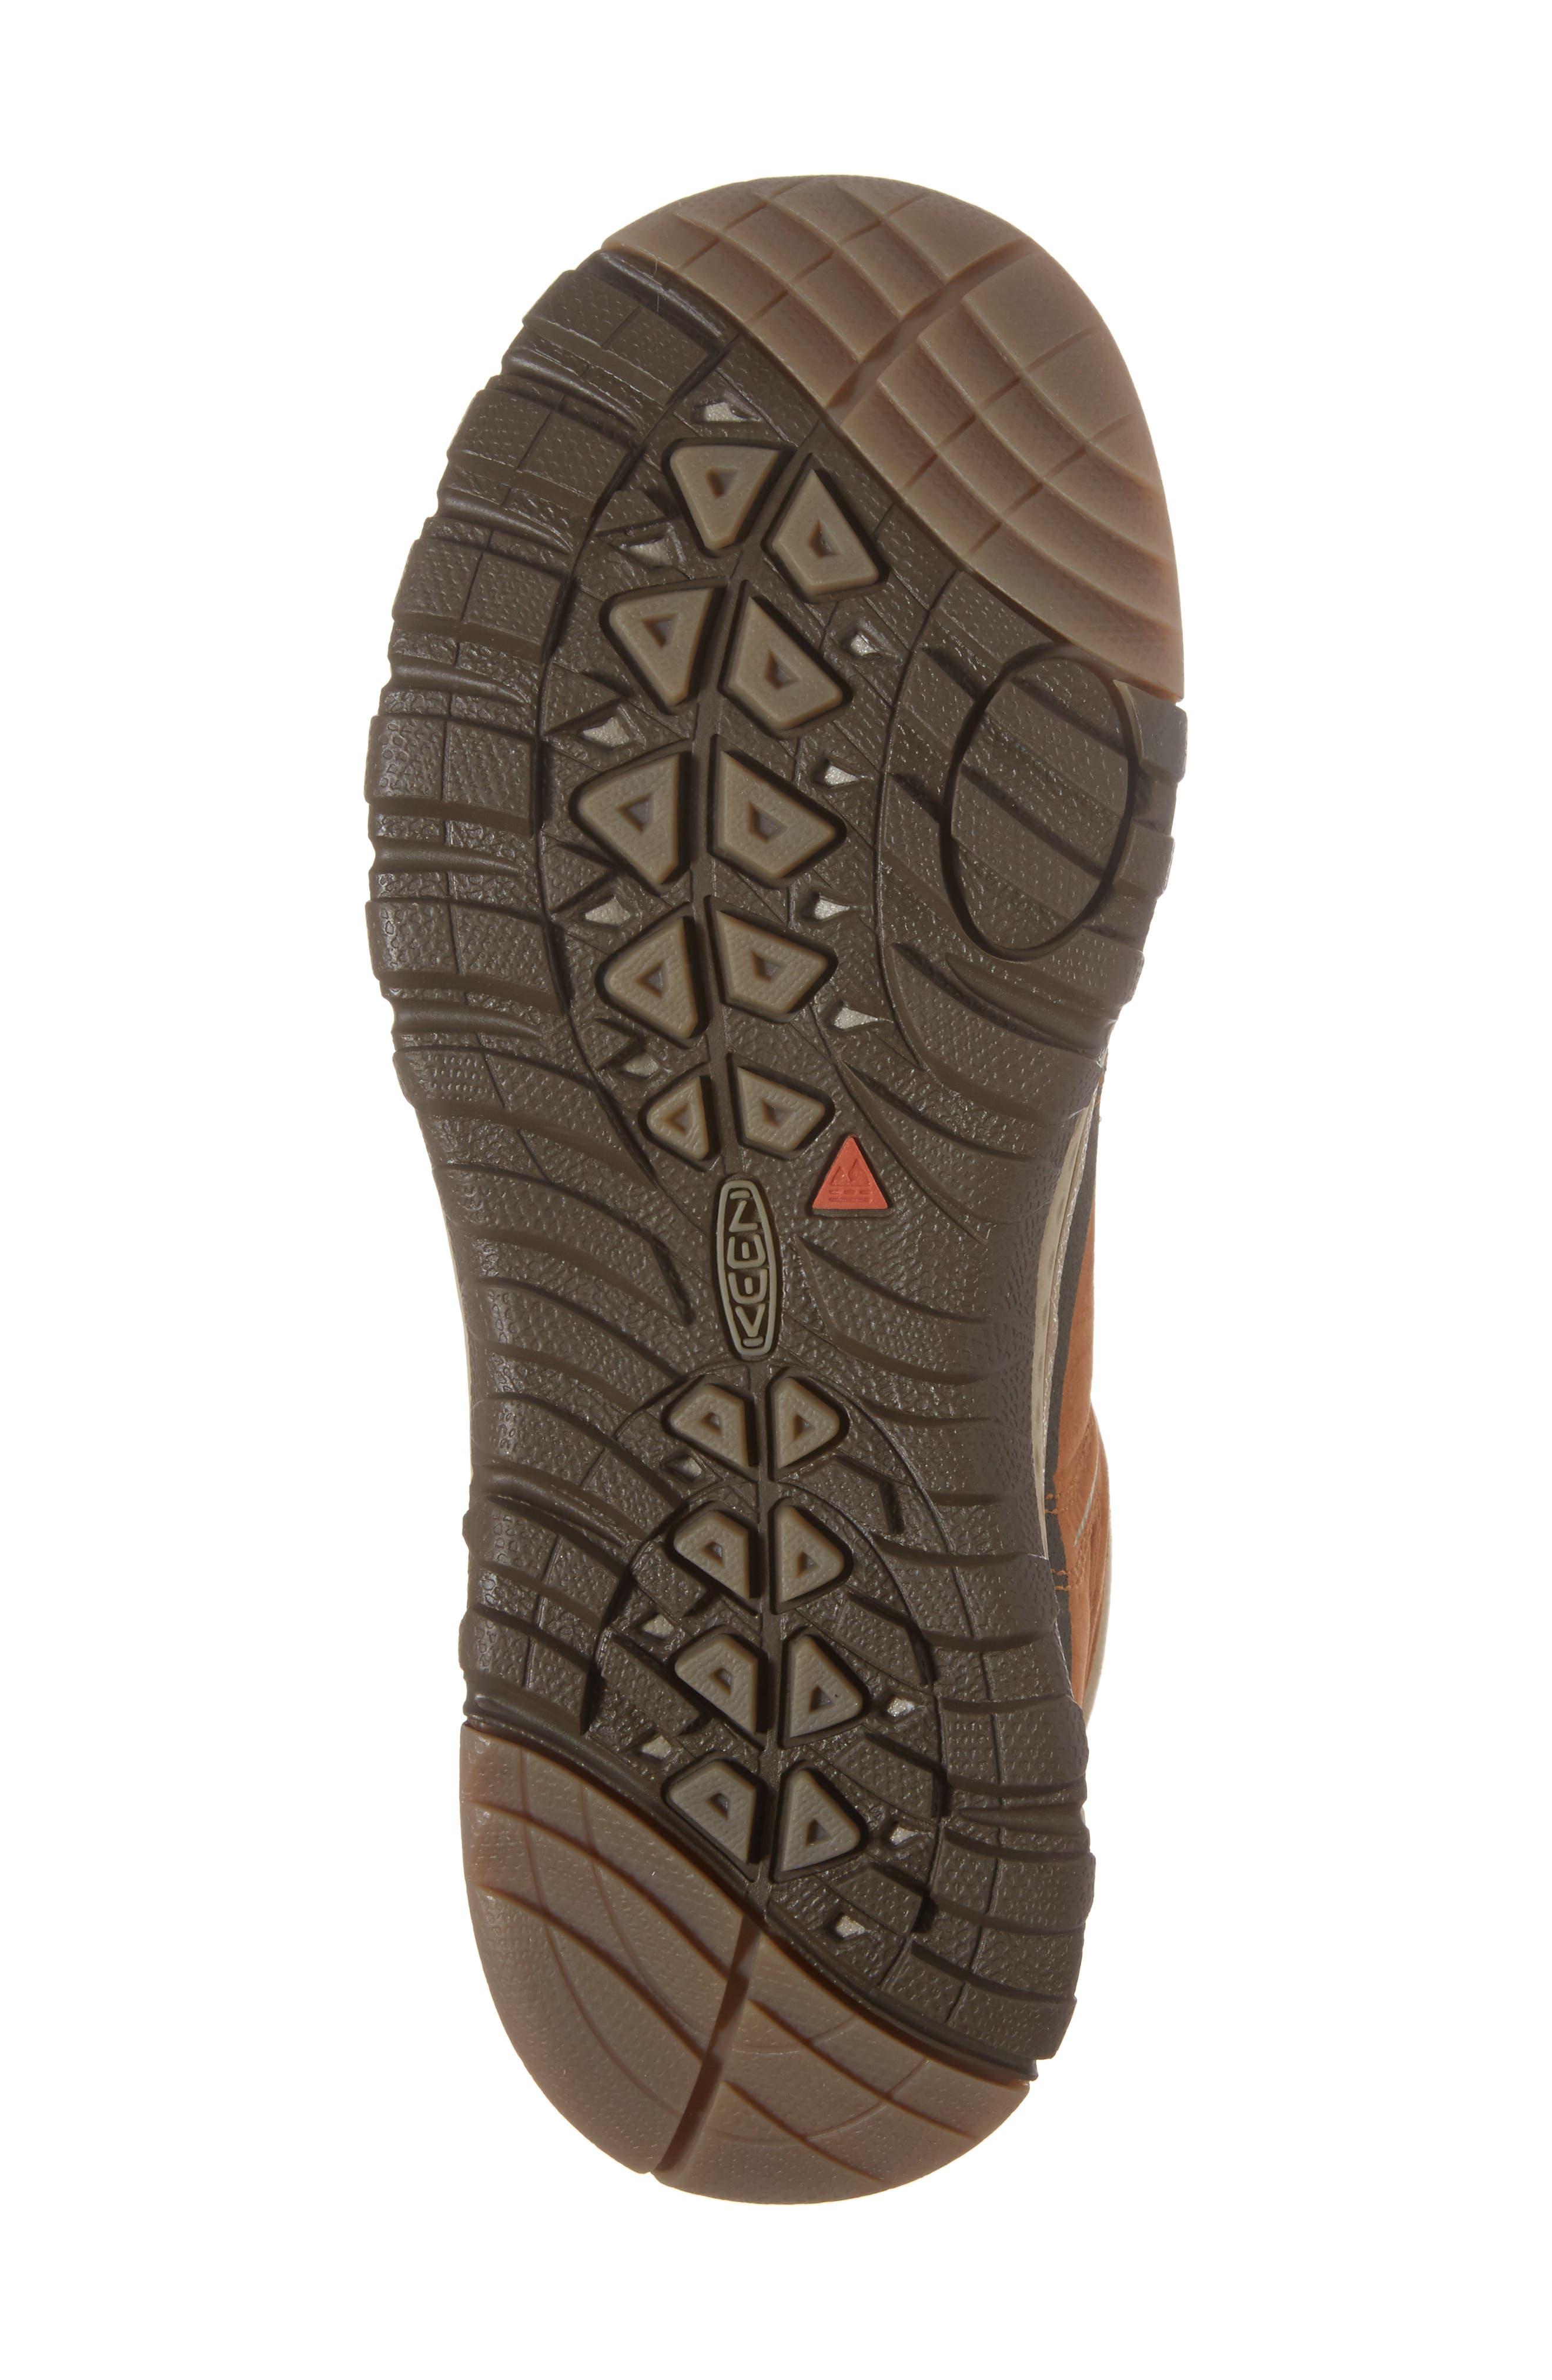 Terradora Leather Waterproof Hiking Boot,                             Alternate thumbnail 6, color,                             TIMBER/ ORANGE NUBUCK